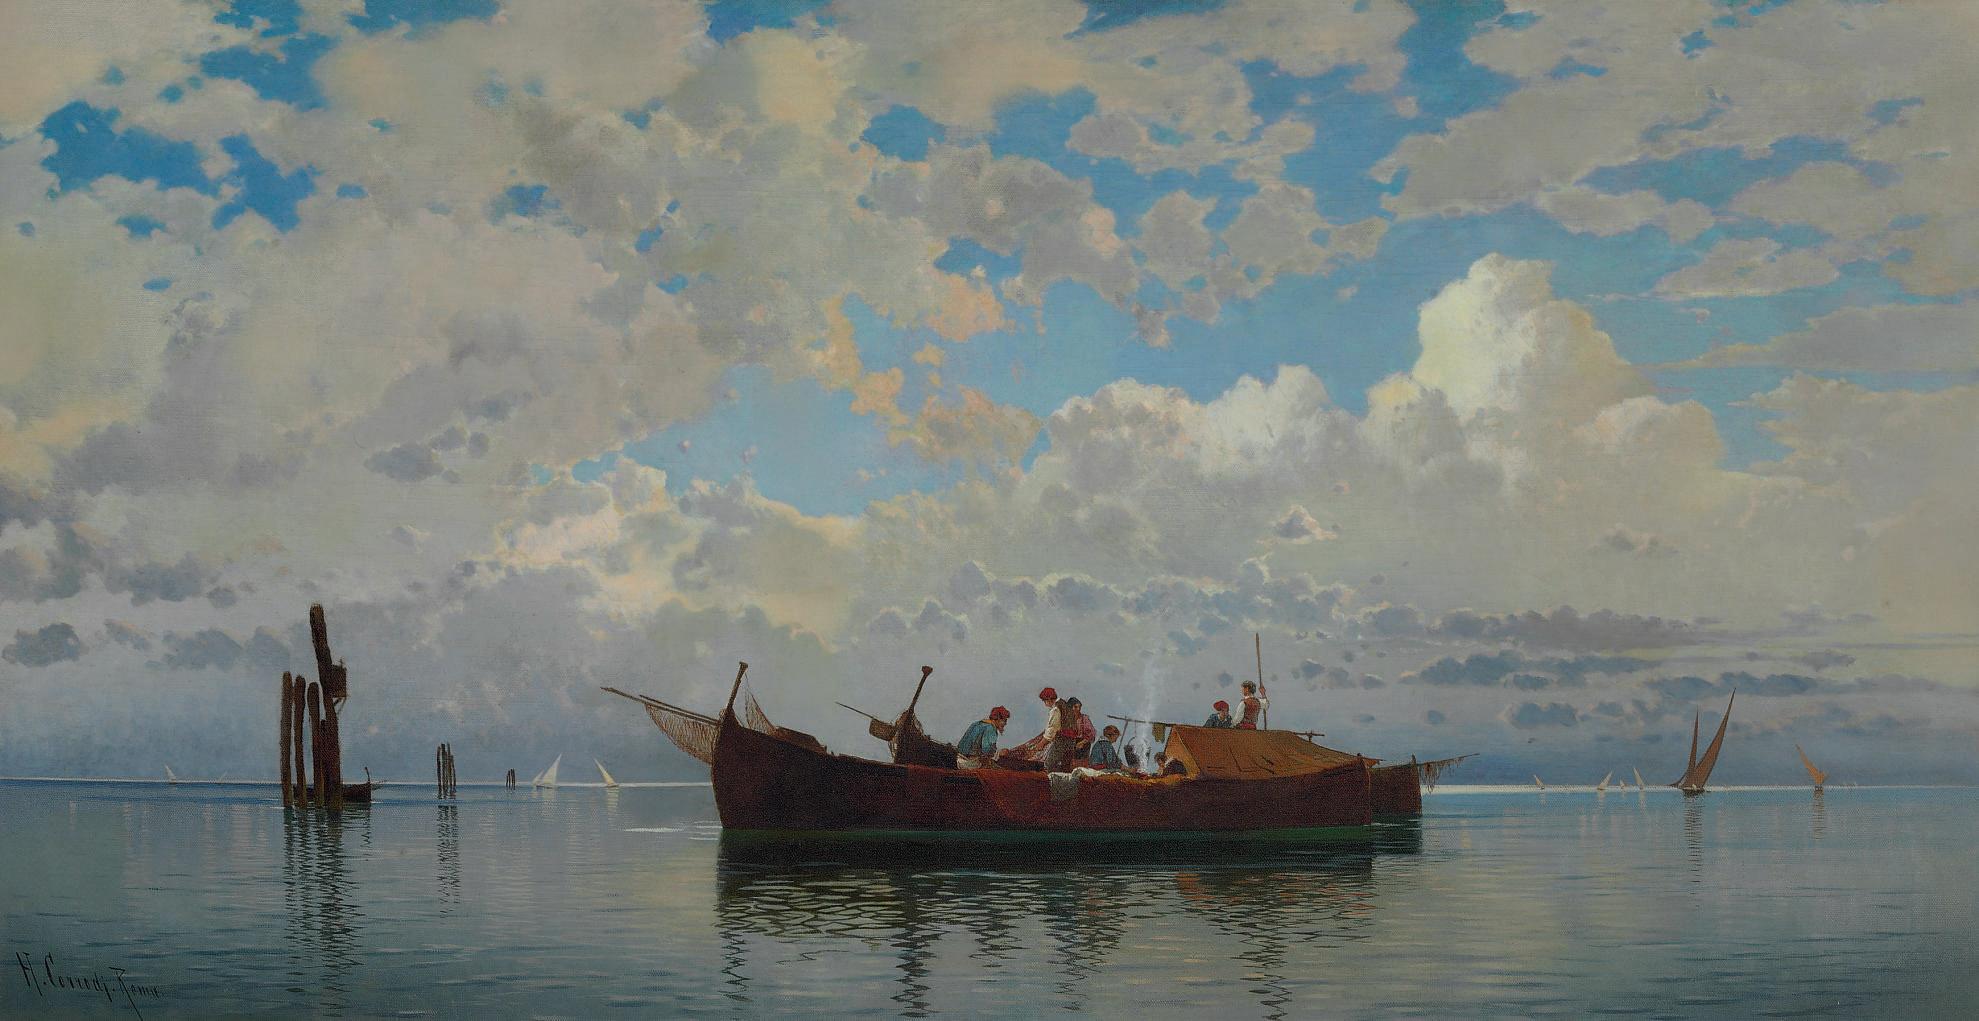 Fishing boats on a Venetian lagoon